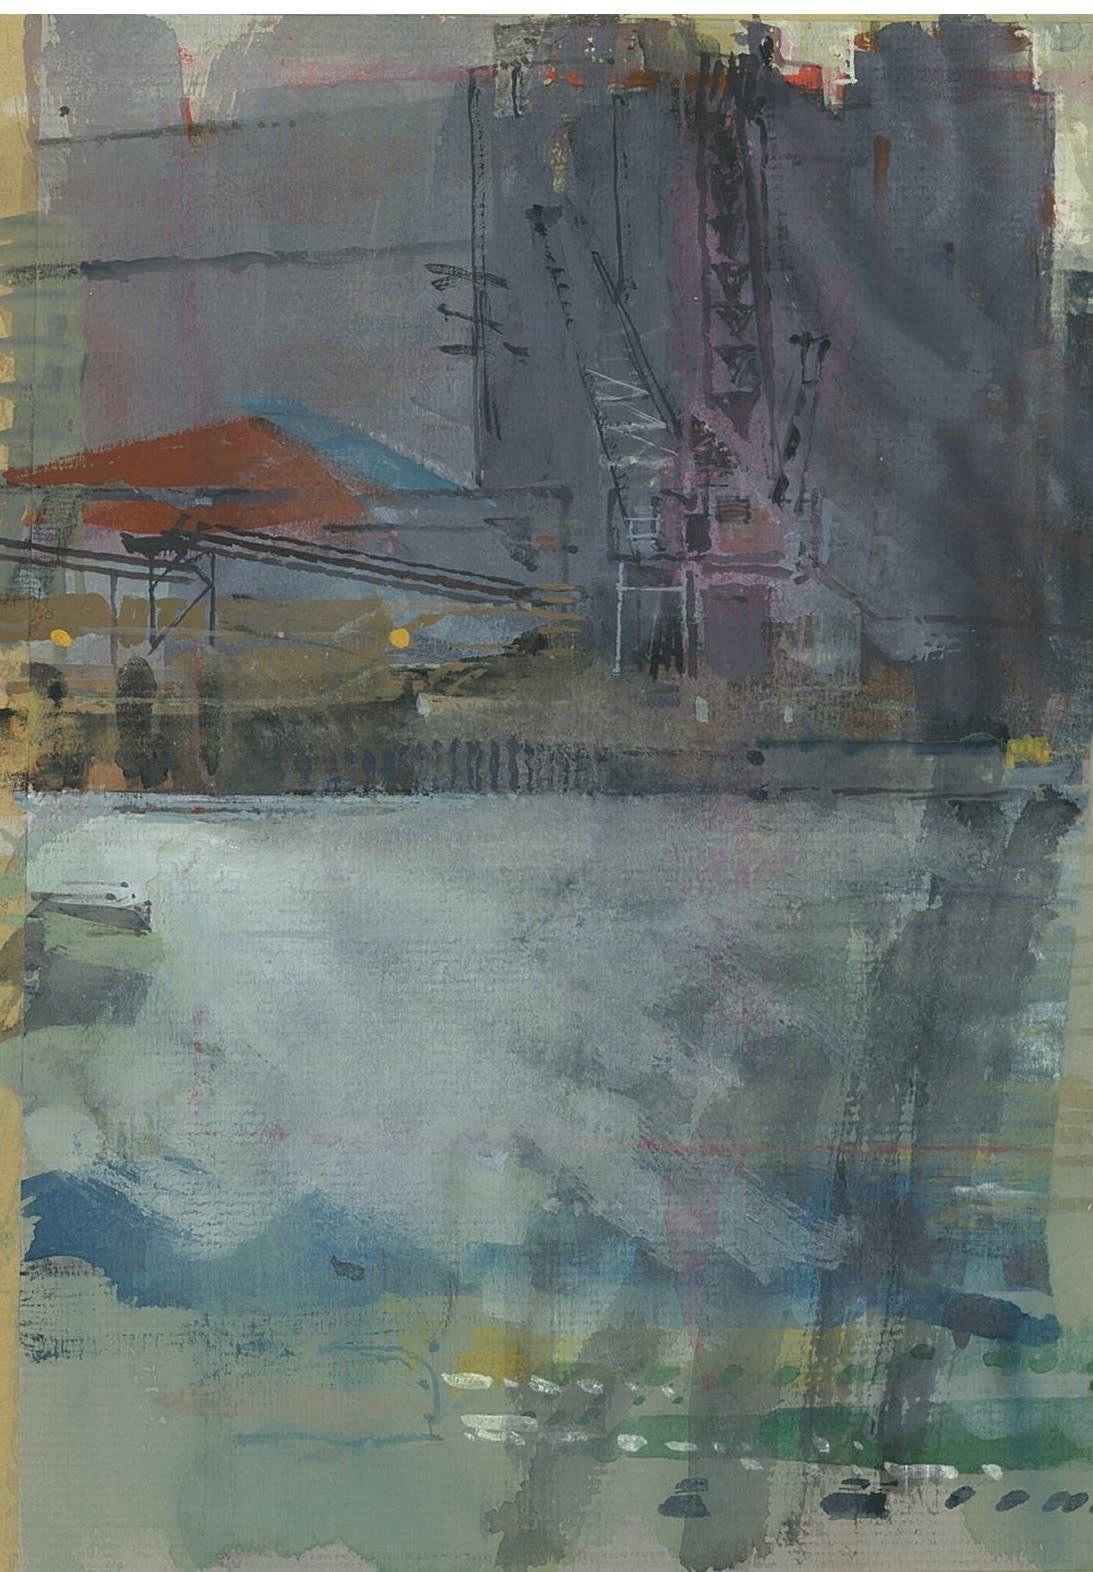 "<span class=""link fancybox-details-link""><a href=""/artists/87-paul-newland/works/11787-paul-newland-thames/"">View Detail Page</a></span><div class=""artist""><span class=""artist""><strong>Paul Newland</strong></span></div><div class=""title""><em>Thames</em></div><div class=""medium"">watercolour</div><div class=""dimensions"">Frame: 58 x 40 cm<br /> Artwork: 20 x 14 cm</div><div class=""price"">£500.00</div>"